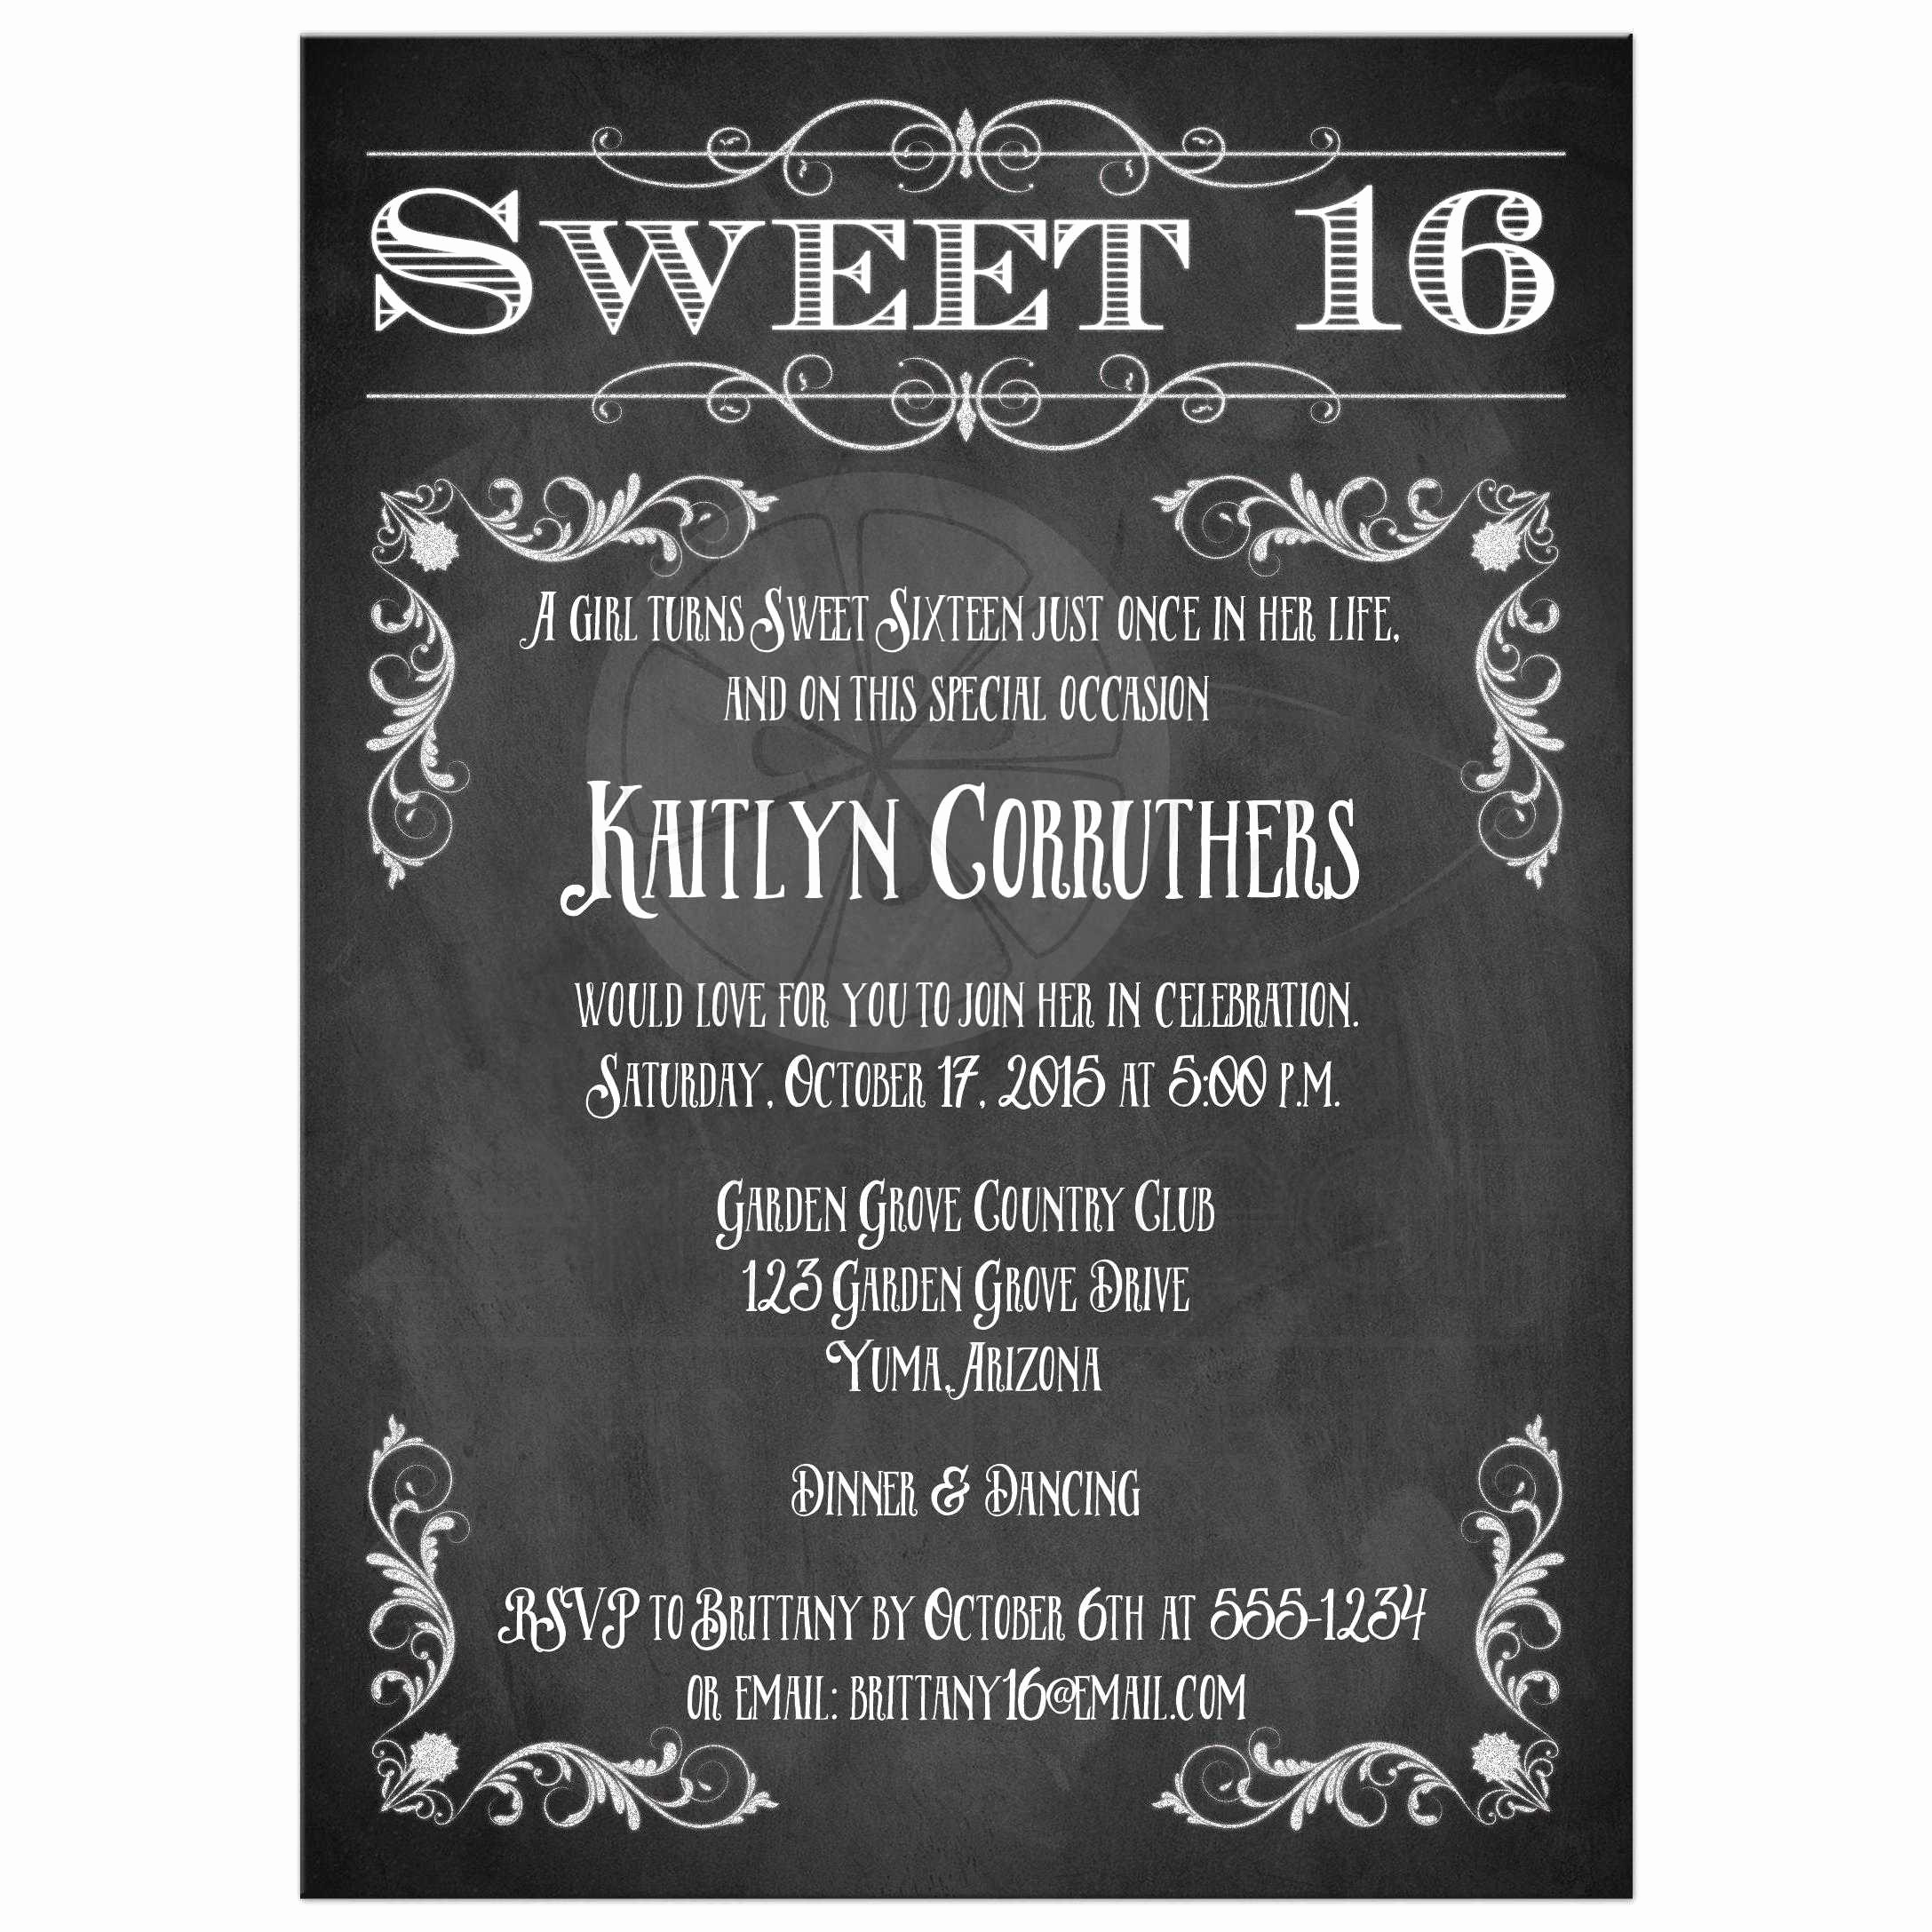 Sweet 16 Invitation Template Inspirational Free Sweet 16 Birthday Invitations – Free Printable